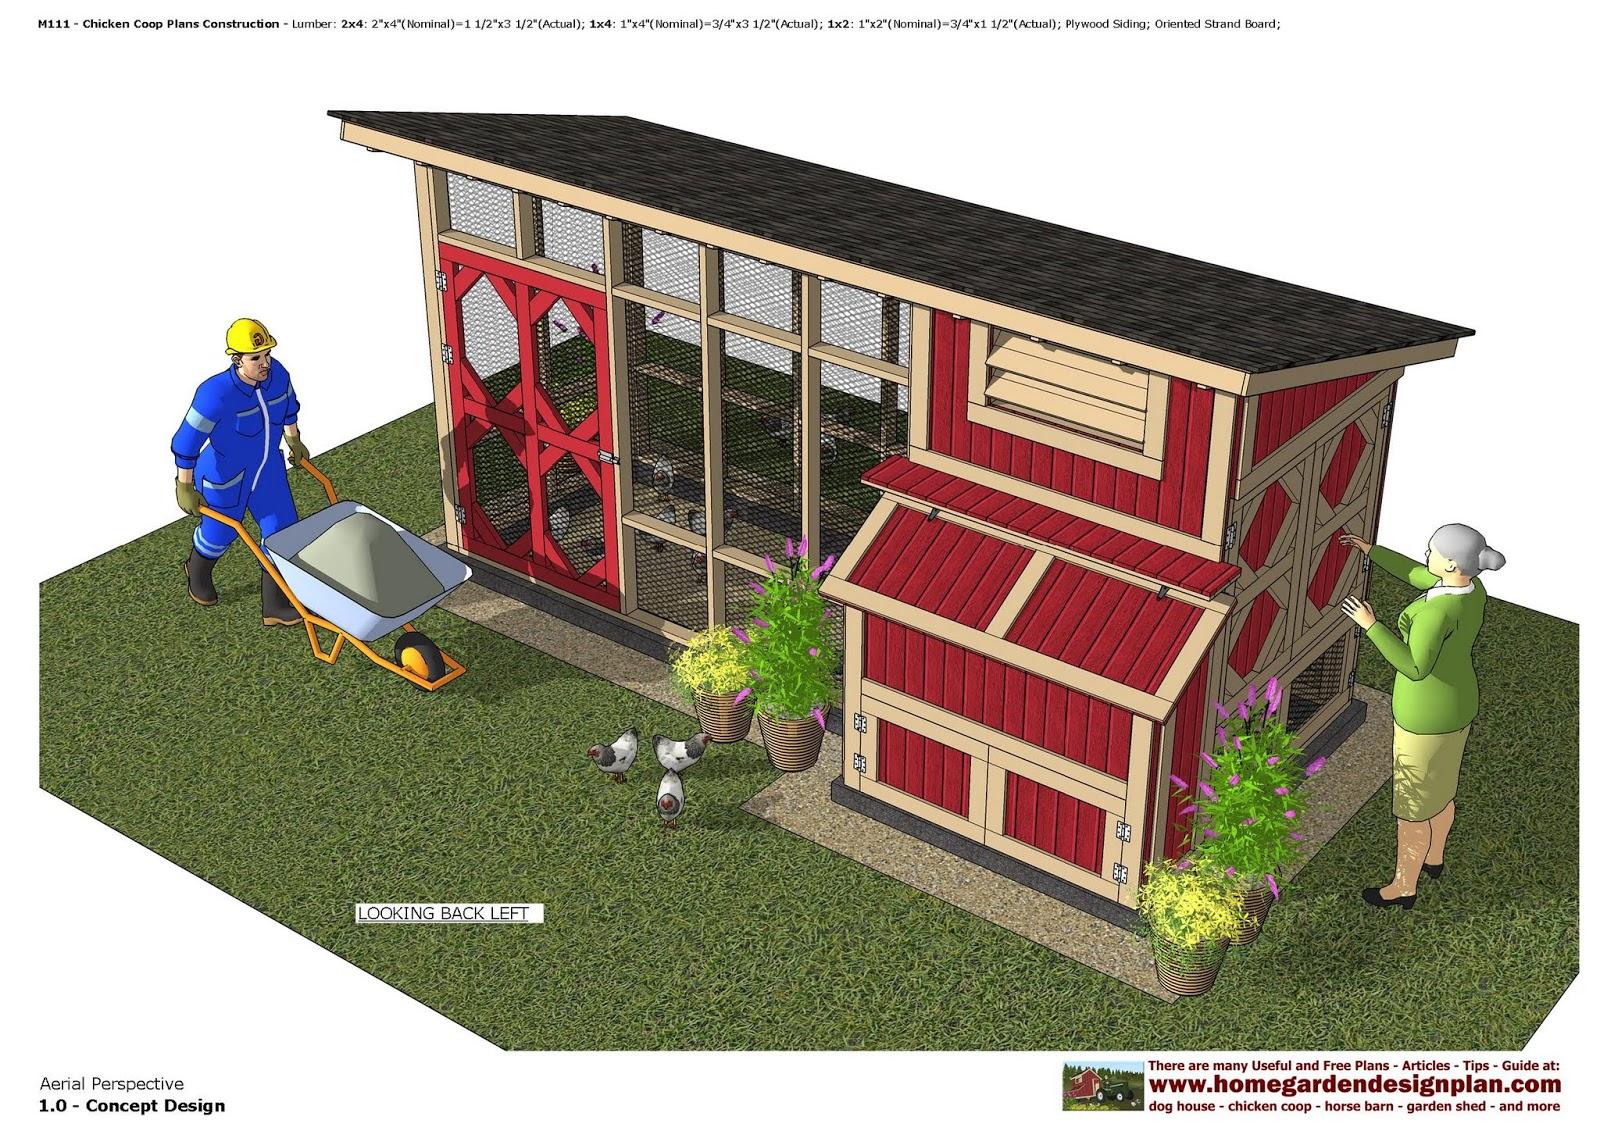 M111   Chicken Coop Plans Construction   Chicken Coop Design   How To Build  A Chicken Coop